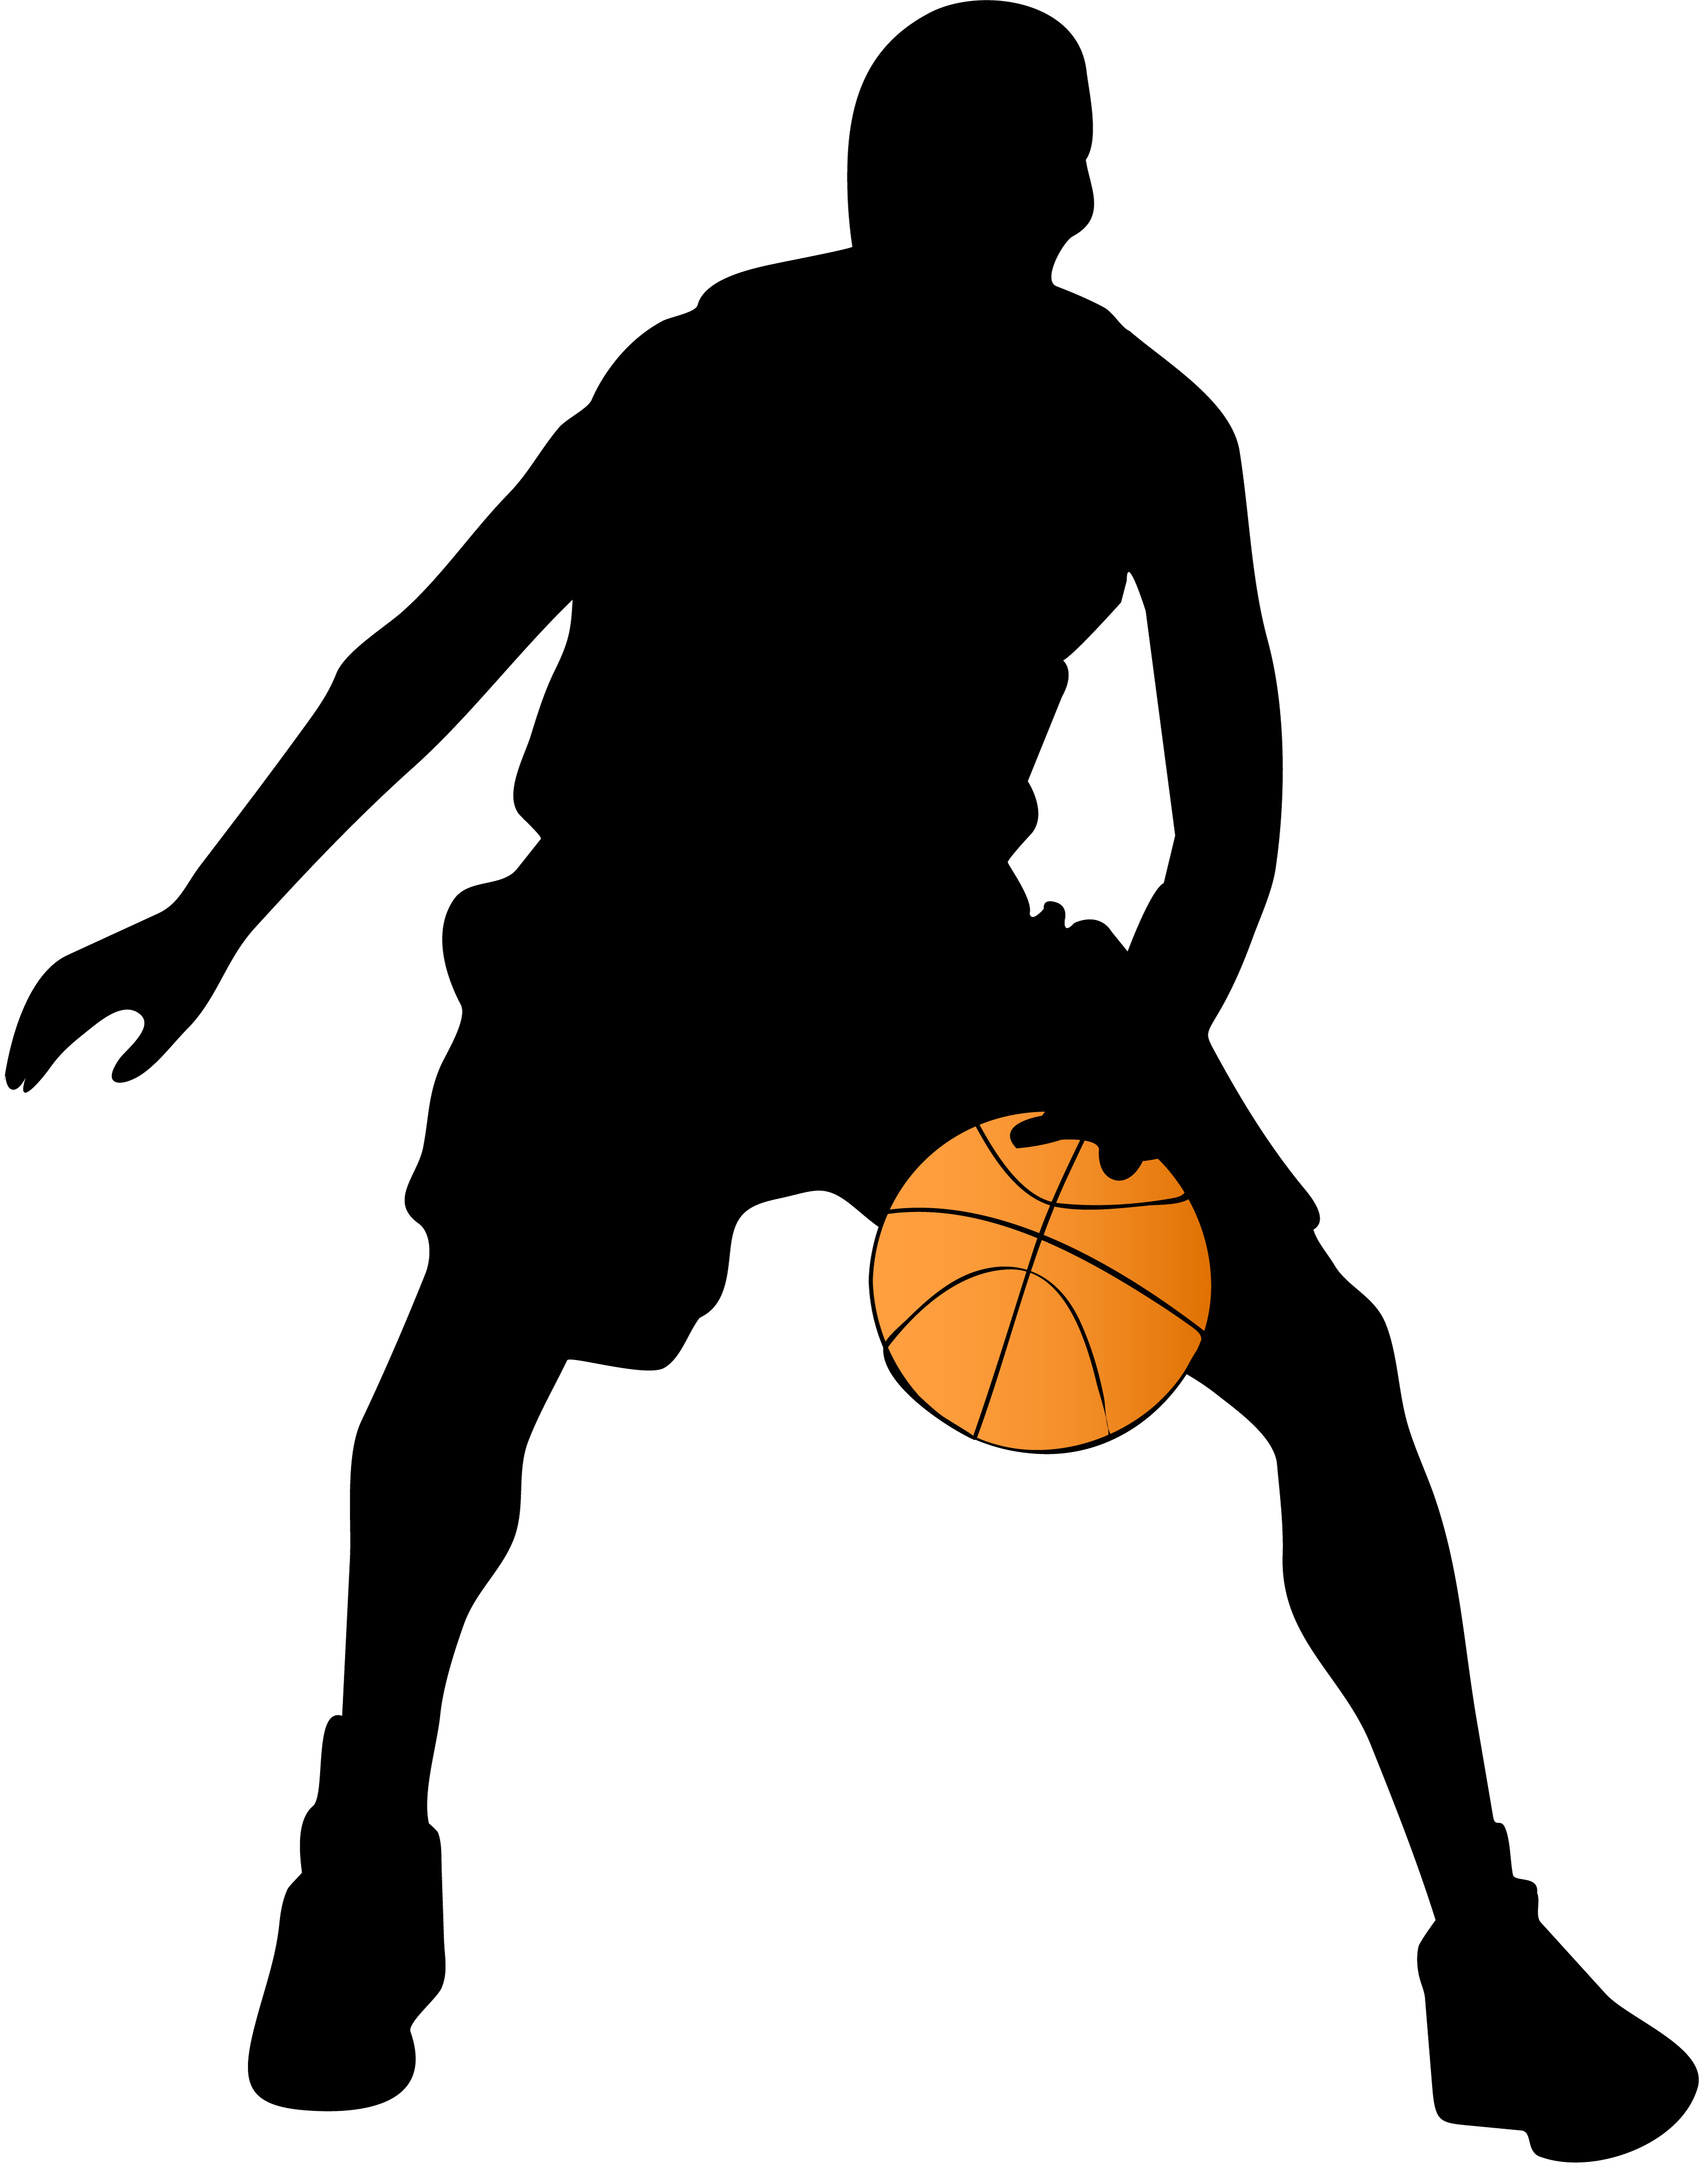 1705x2170 Basketball Clipart Silhouette Amp Basketball Clip Art Silhouette